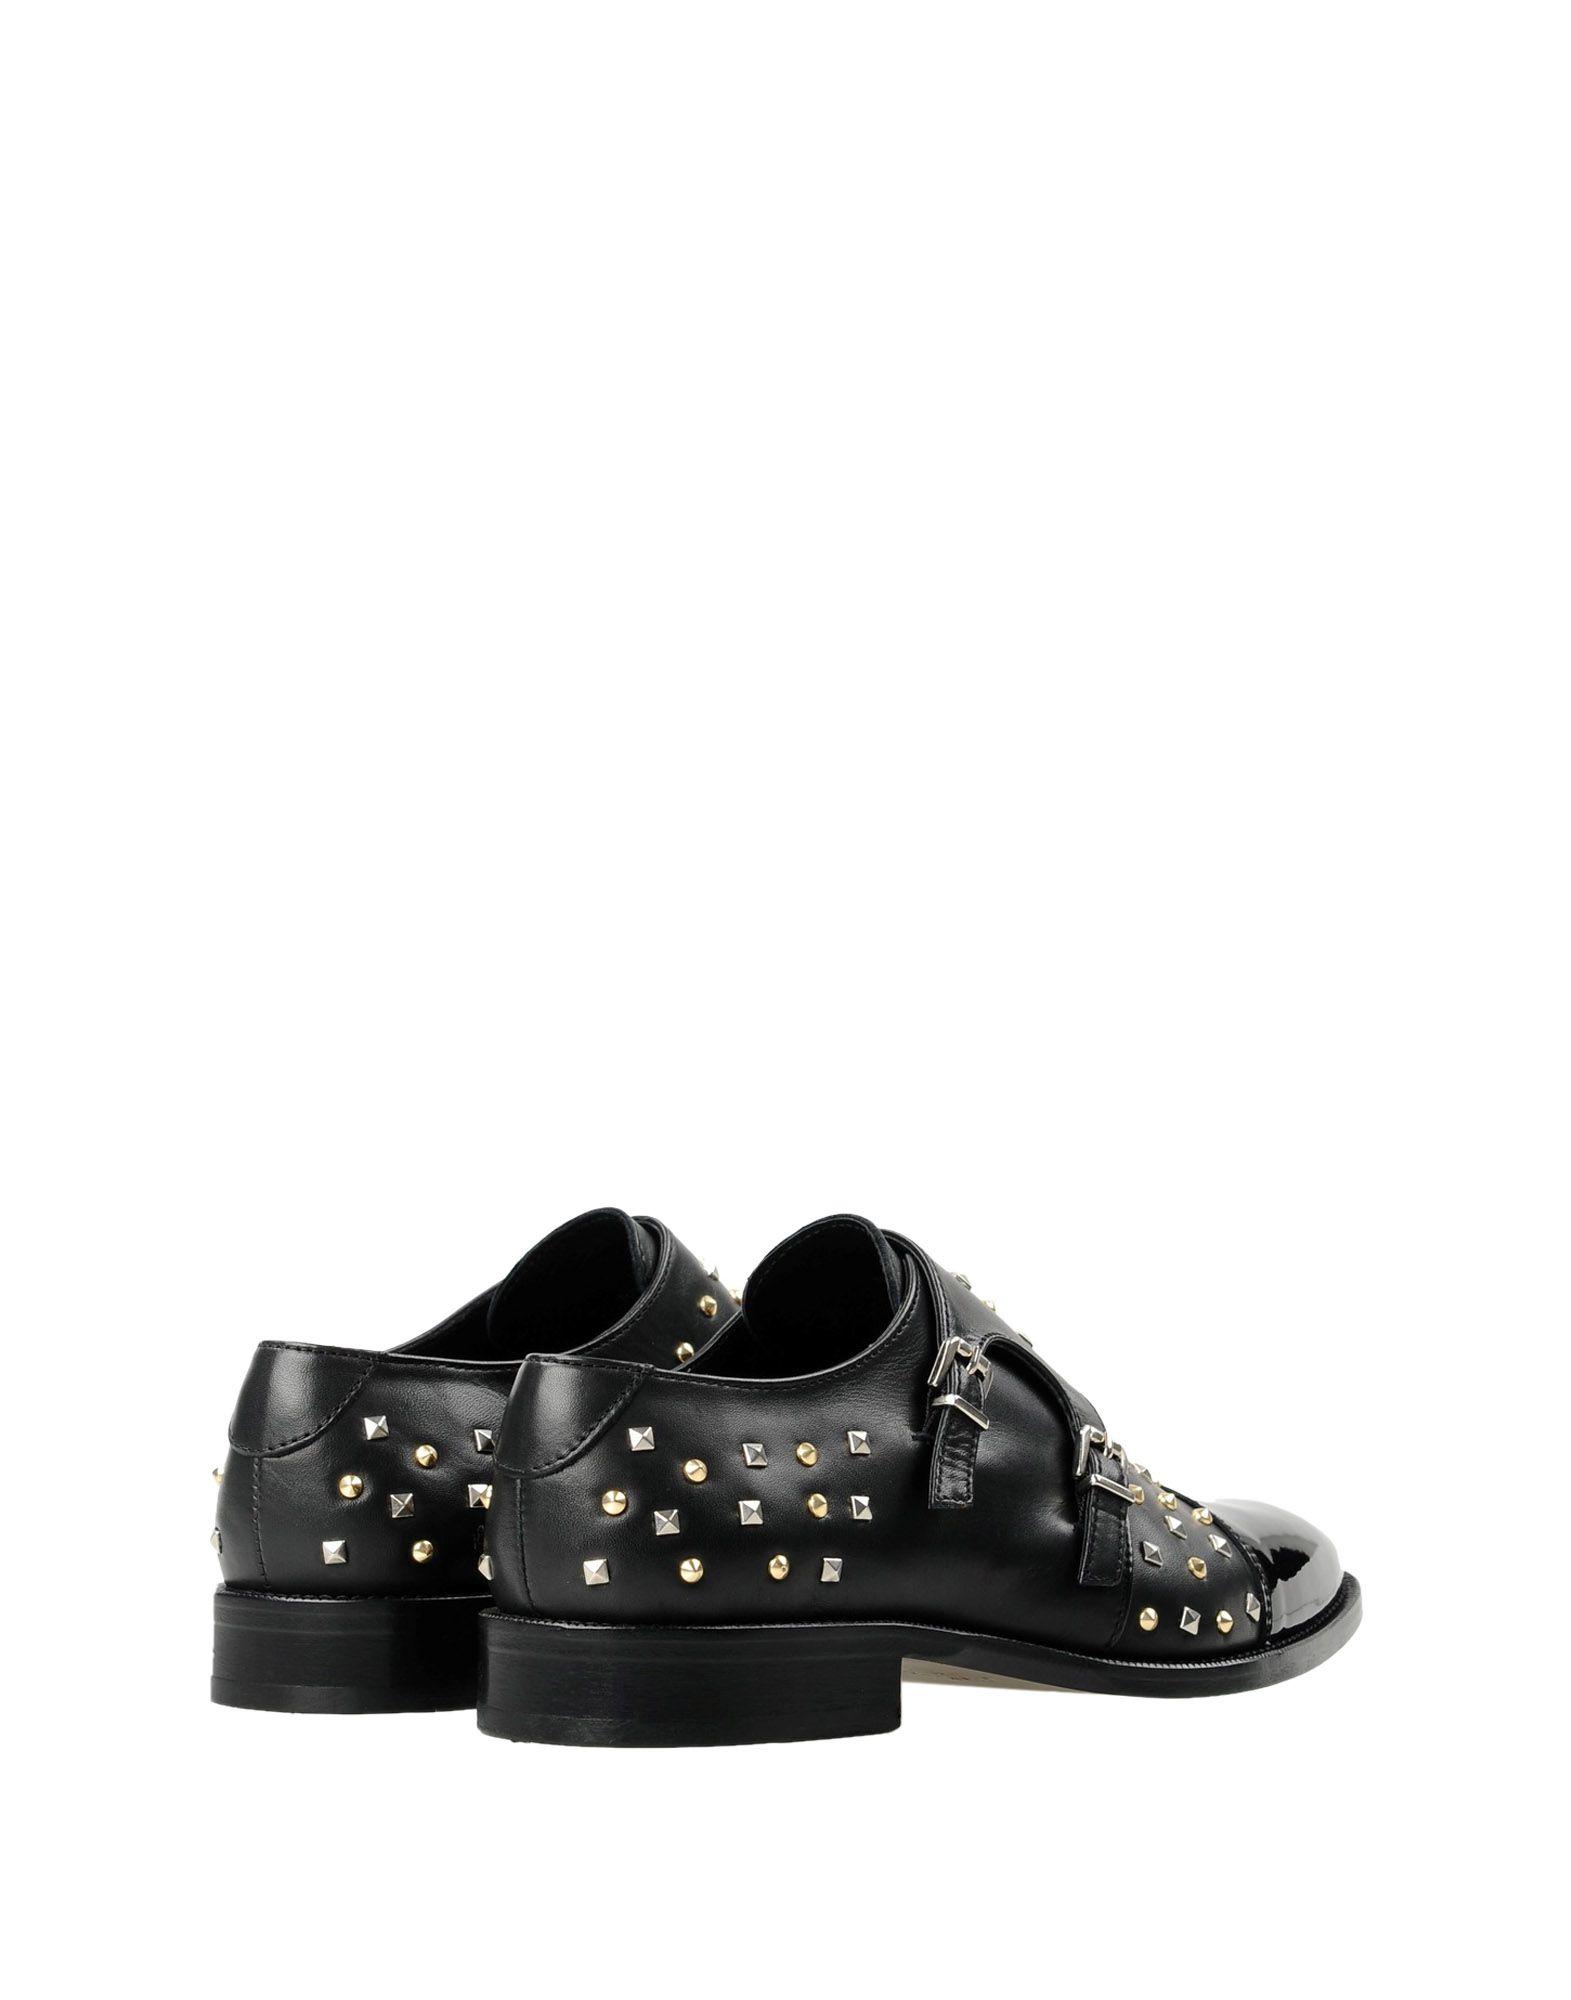 Rabatt  Schuhe The Kooples Afch1511  Rabatt 11311996XI 152b48